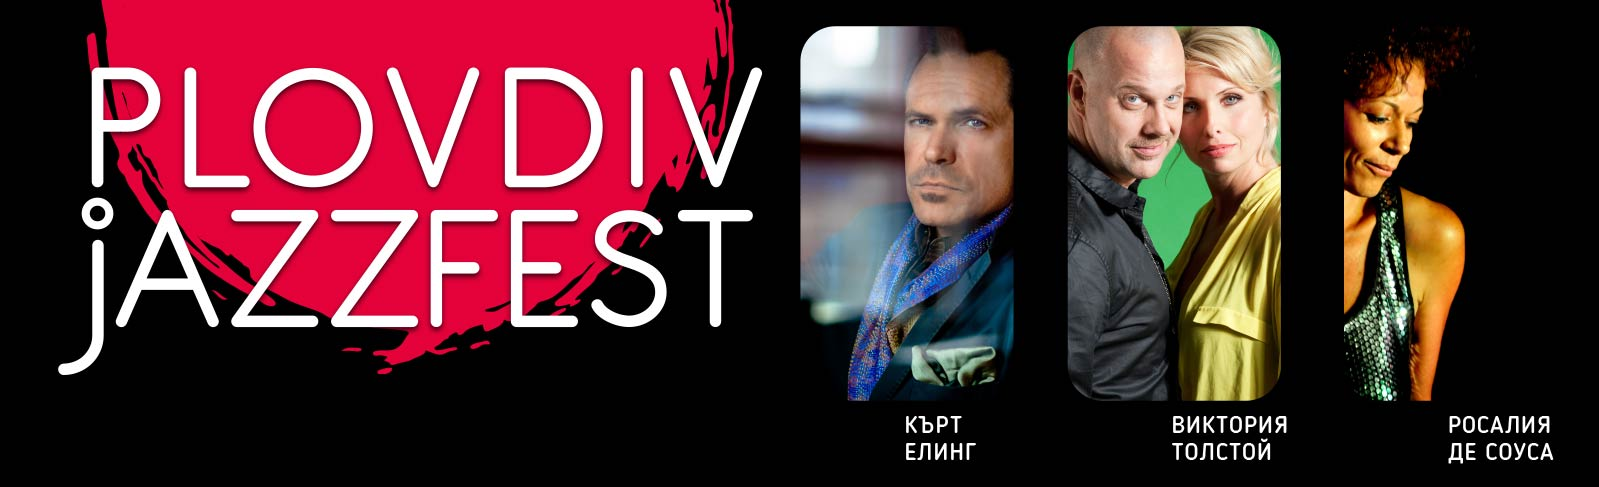 plovdiv-jazz-fest-2018-performers